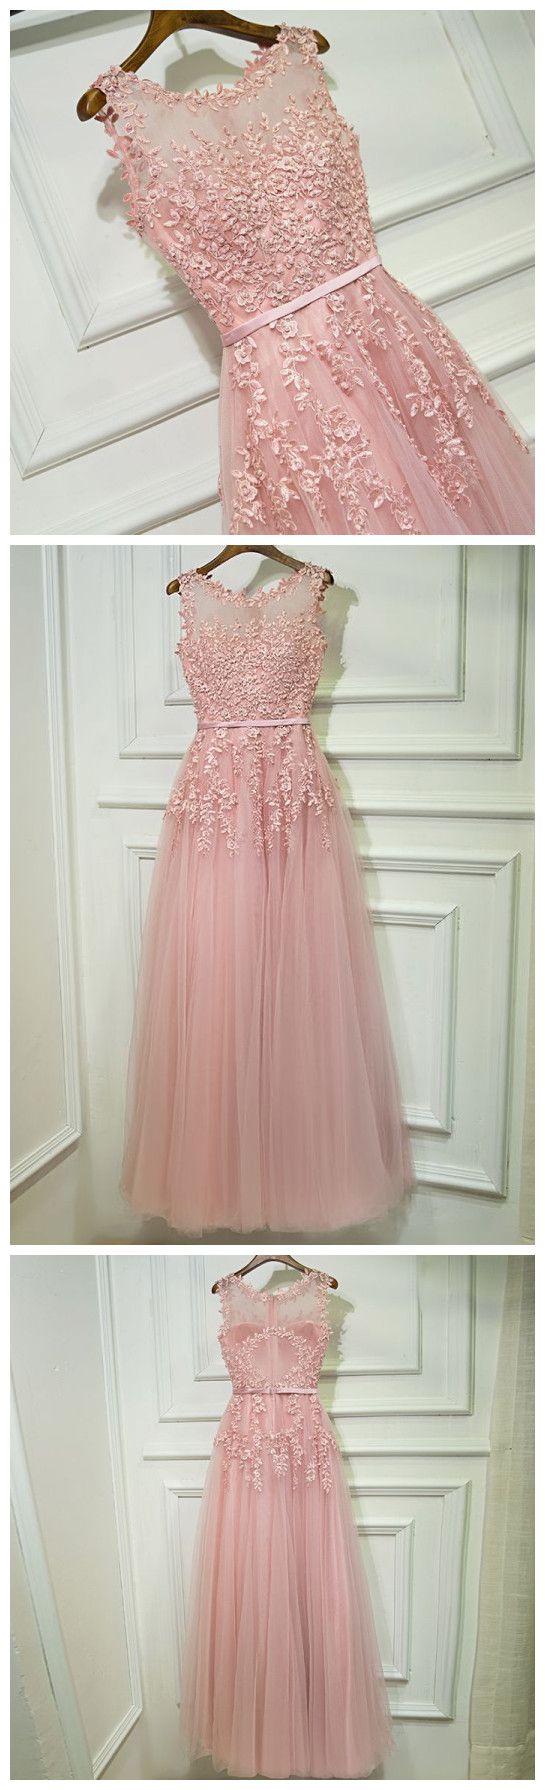 prom dresses long,prom dresses vintage,prom dresses pink,prom dresses peach,prom dresses a line #amyprom #longpromdress #fashion #love #party #formal